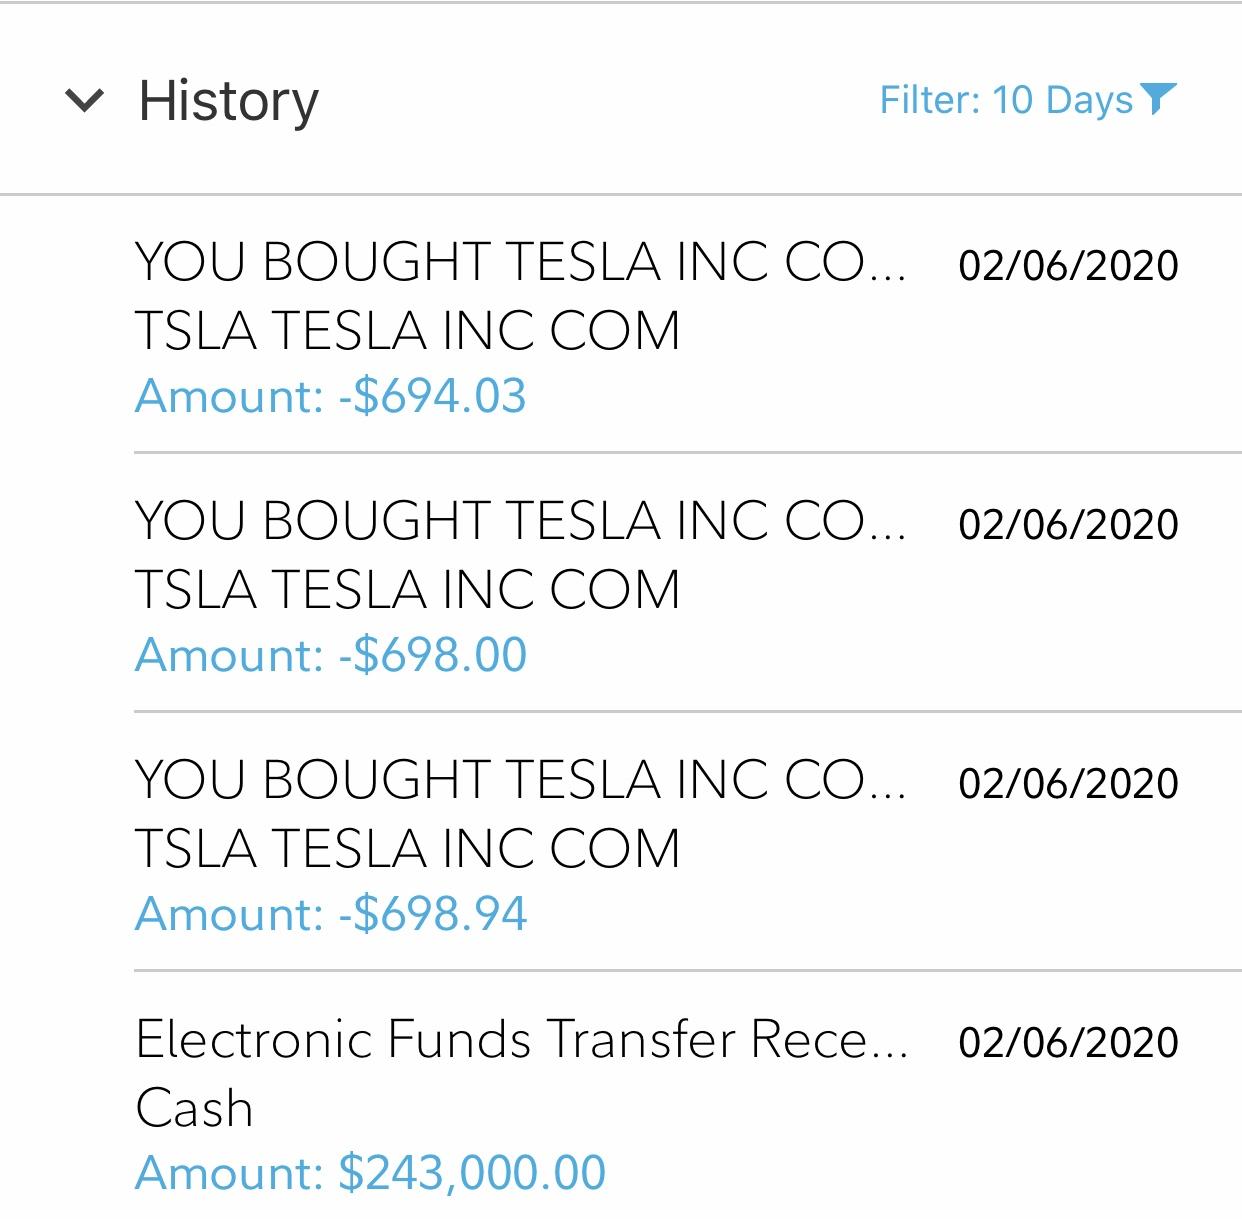 Financial Samurai purchasing Tesla stock